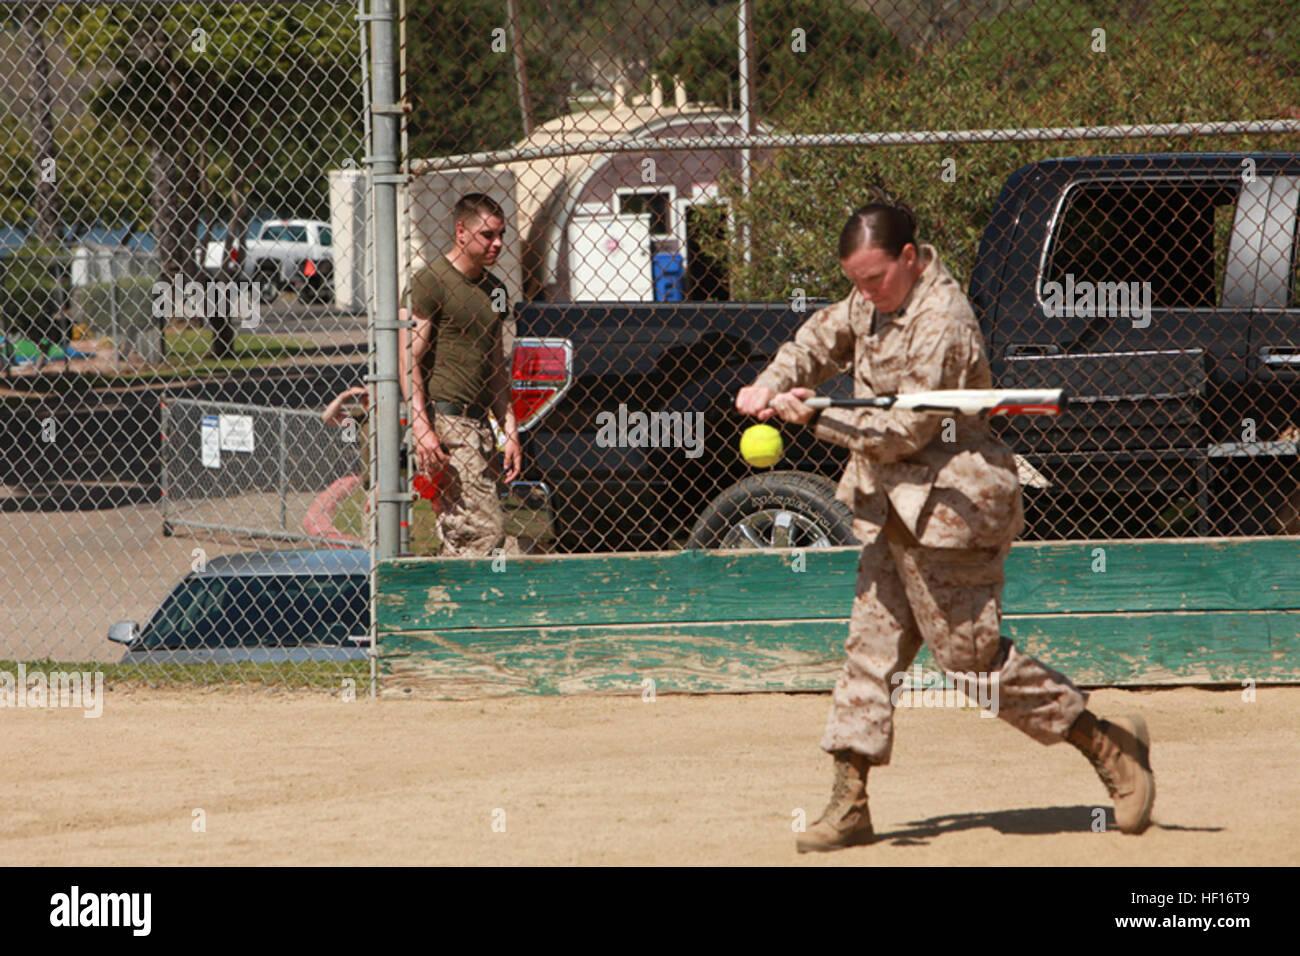 Armed Forces Softball Tournament Stockfotos & Armed Forces Softball ...